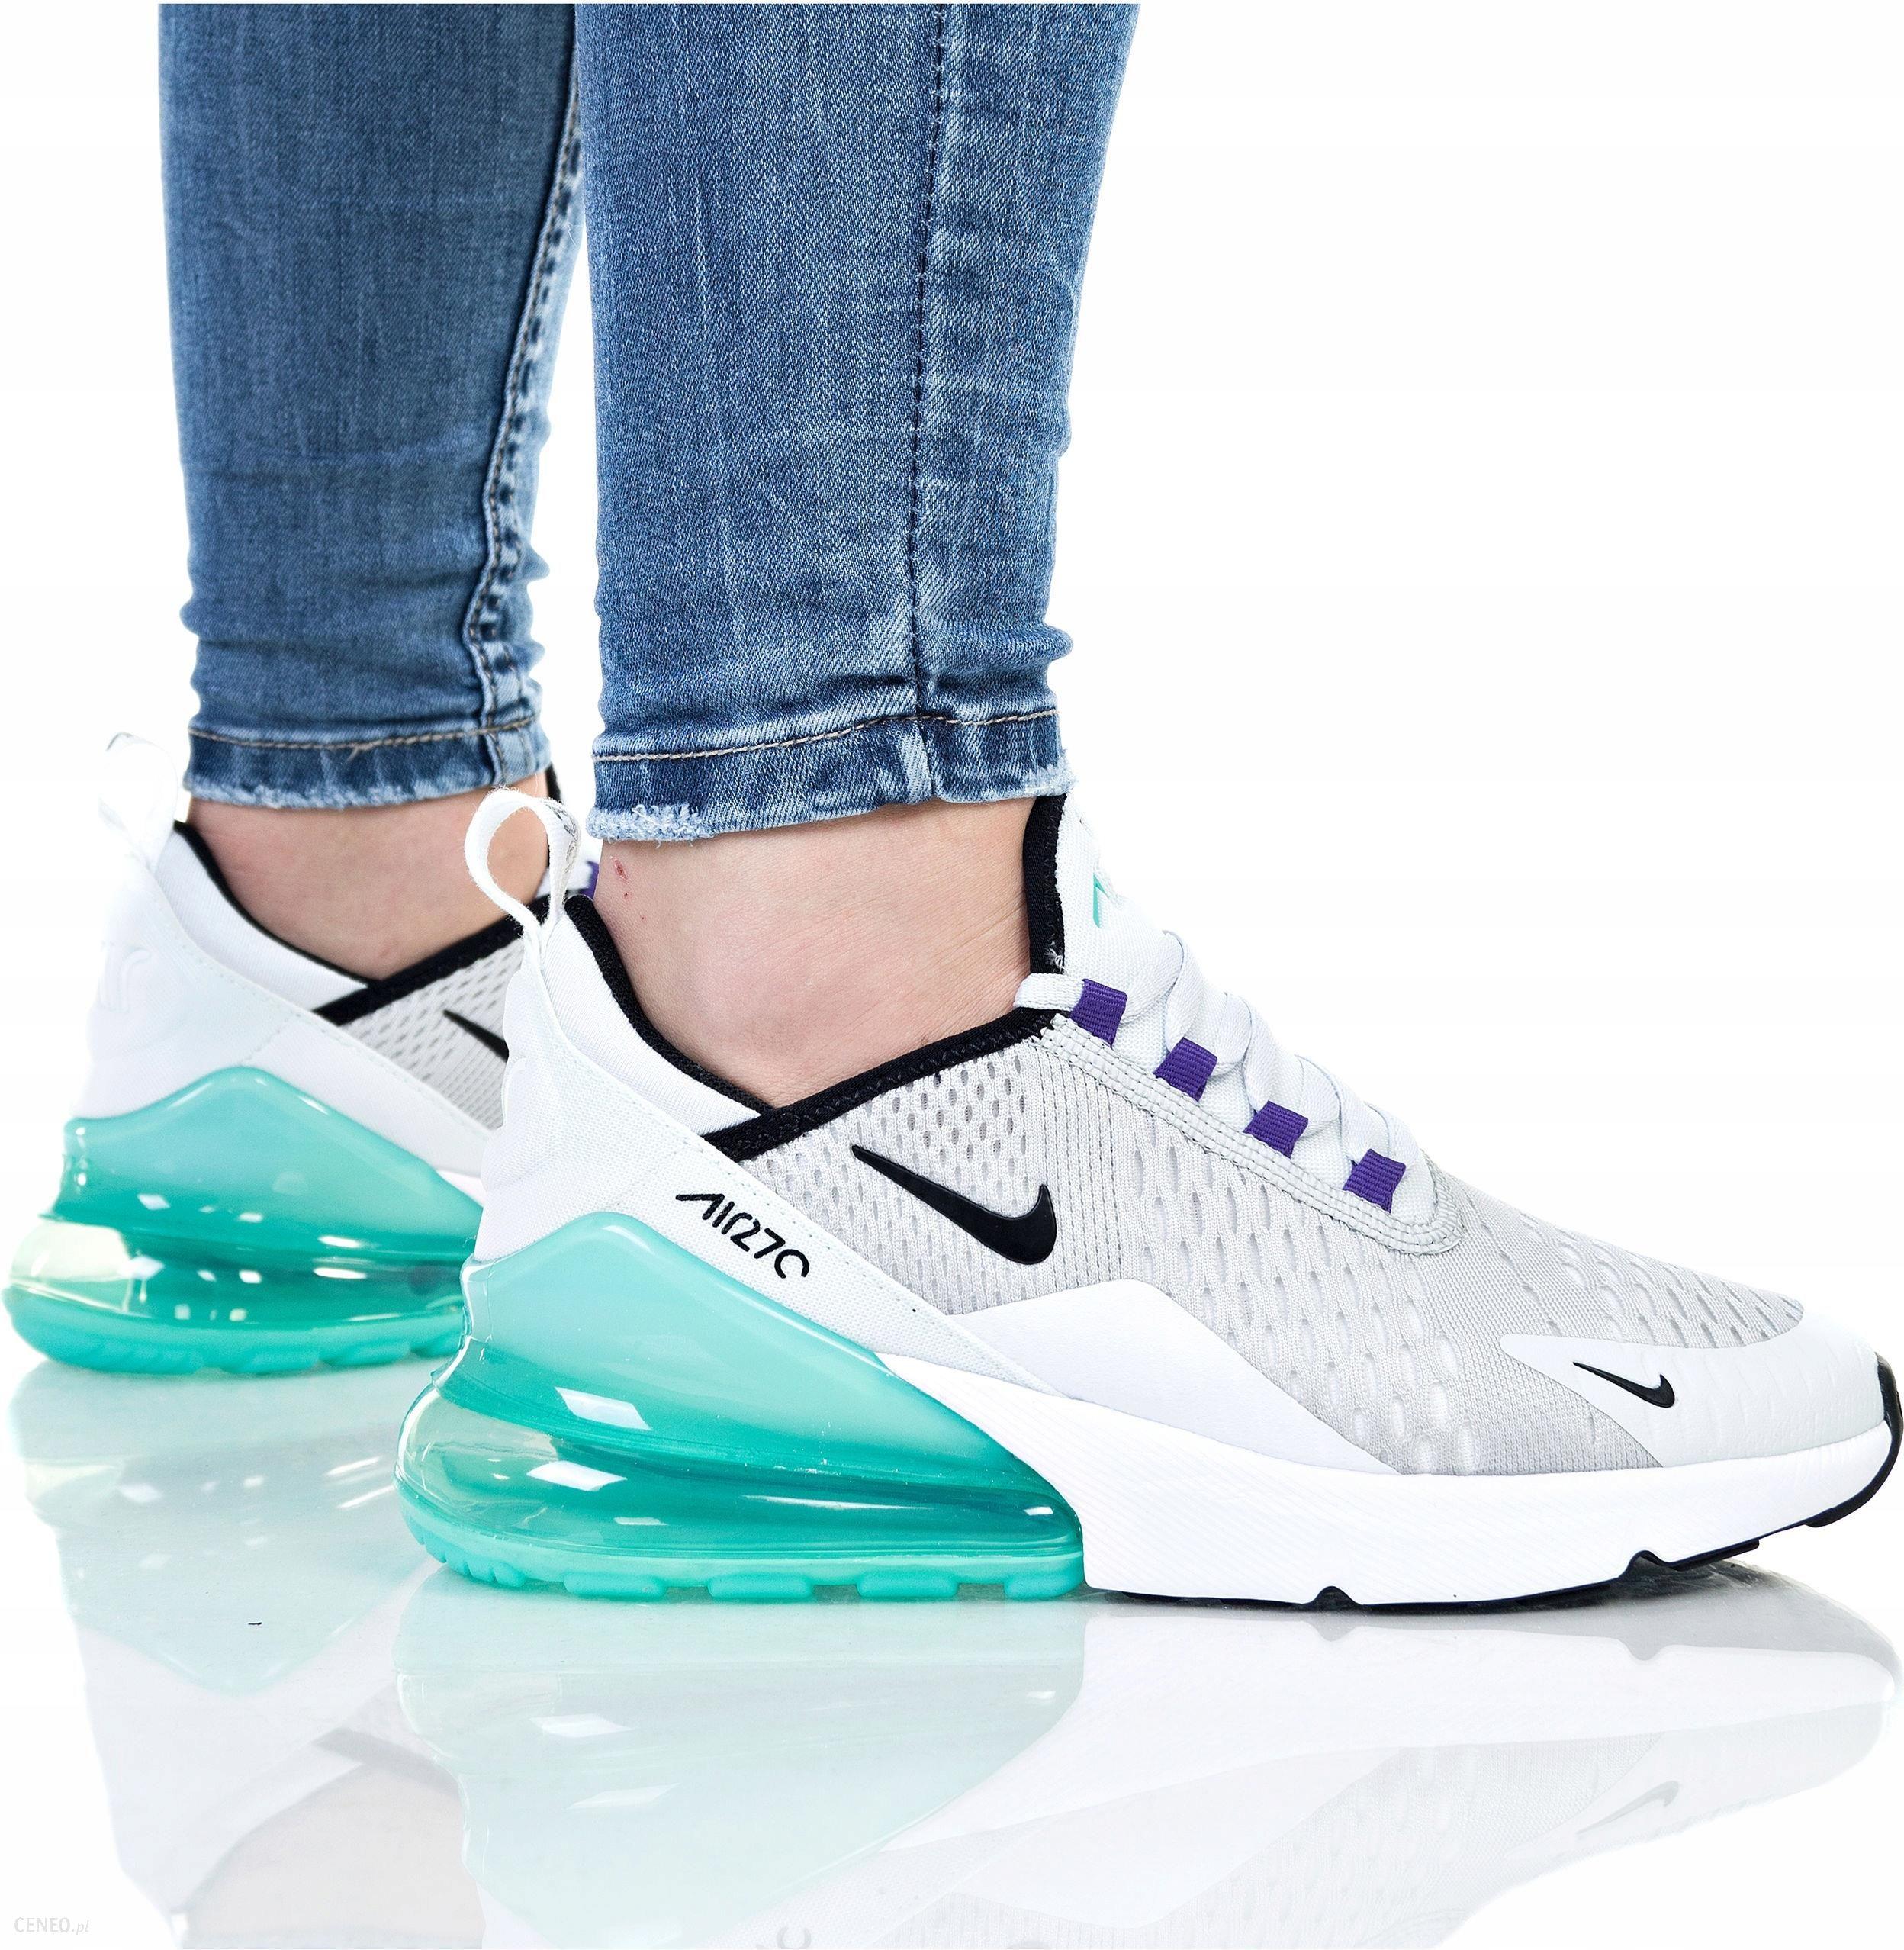 Buty Nike Damskie Air Max 270 943345 010 R. 37.5 Ceny i